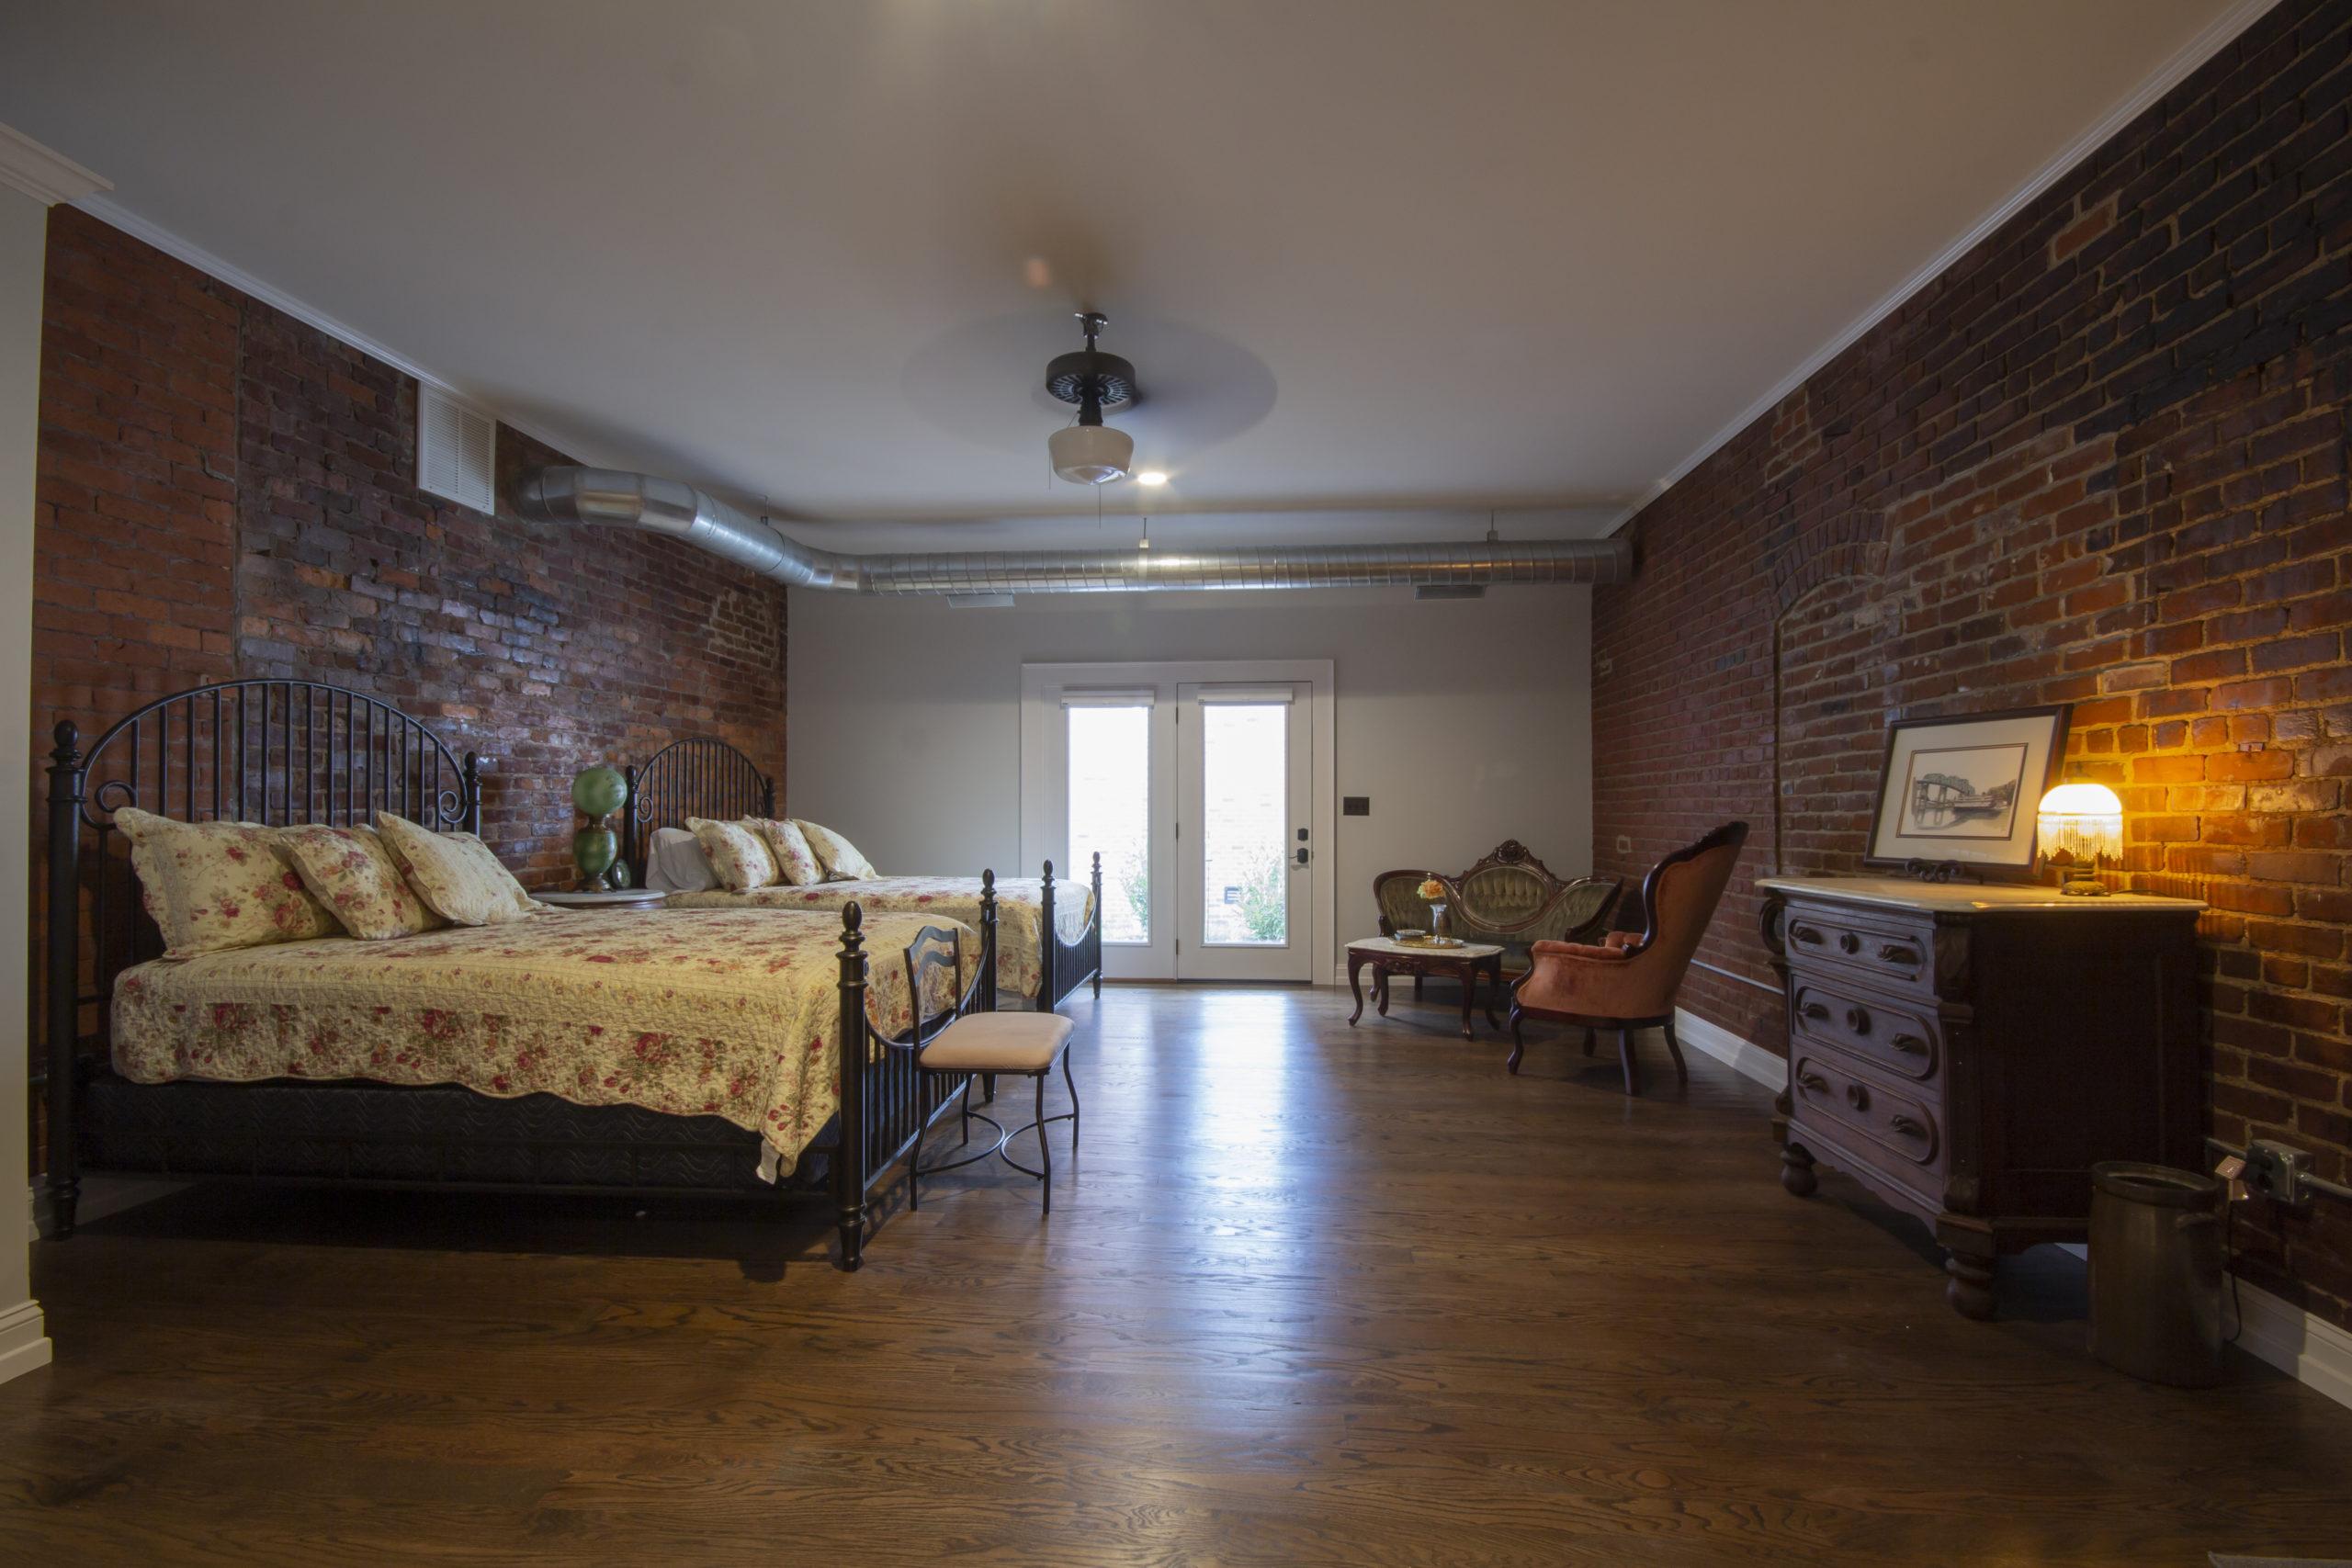 The Historic Belle Louise Bed & Breakfast Paducah, K